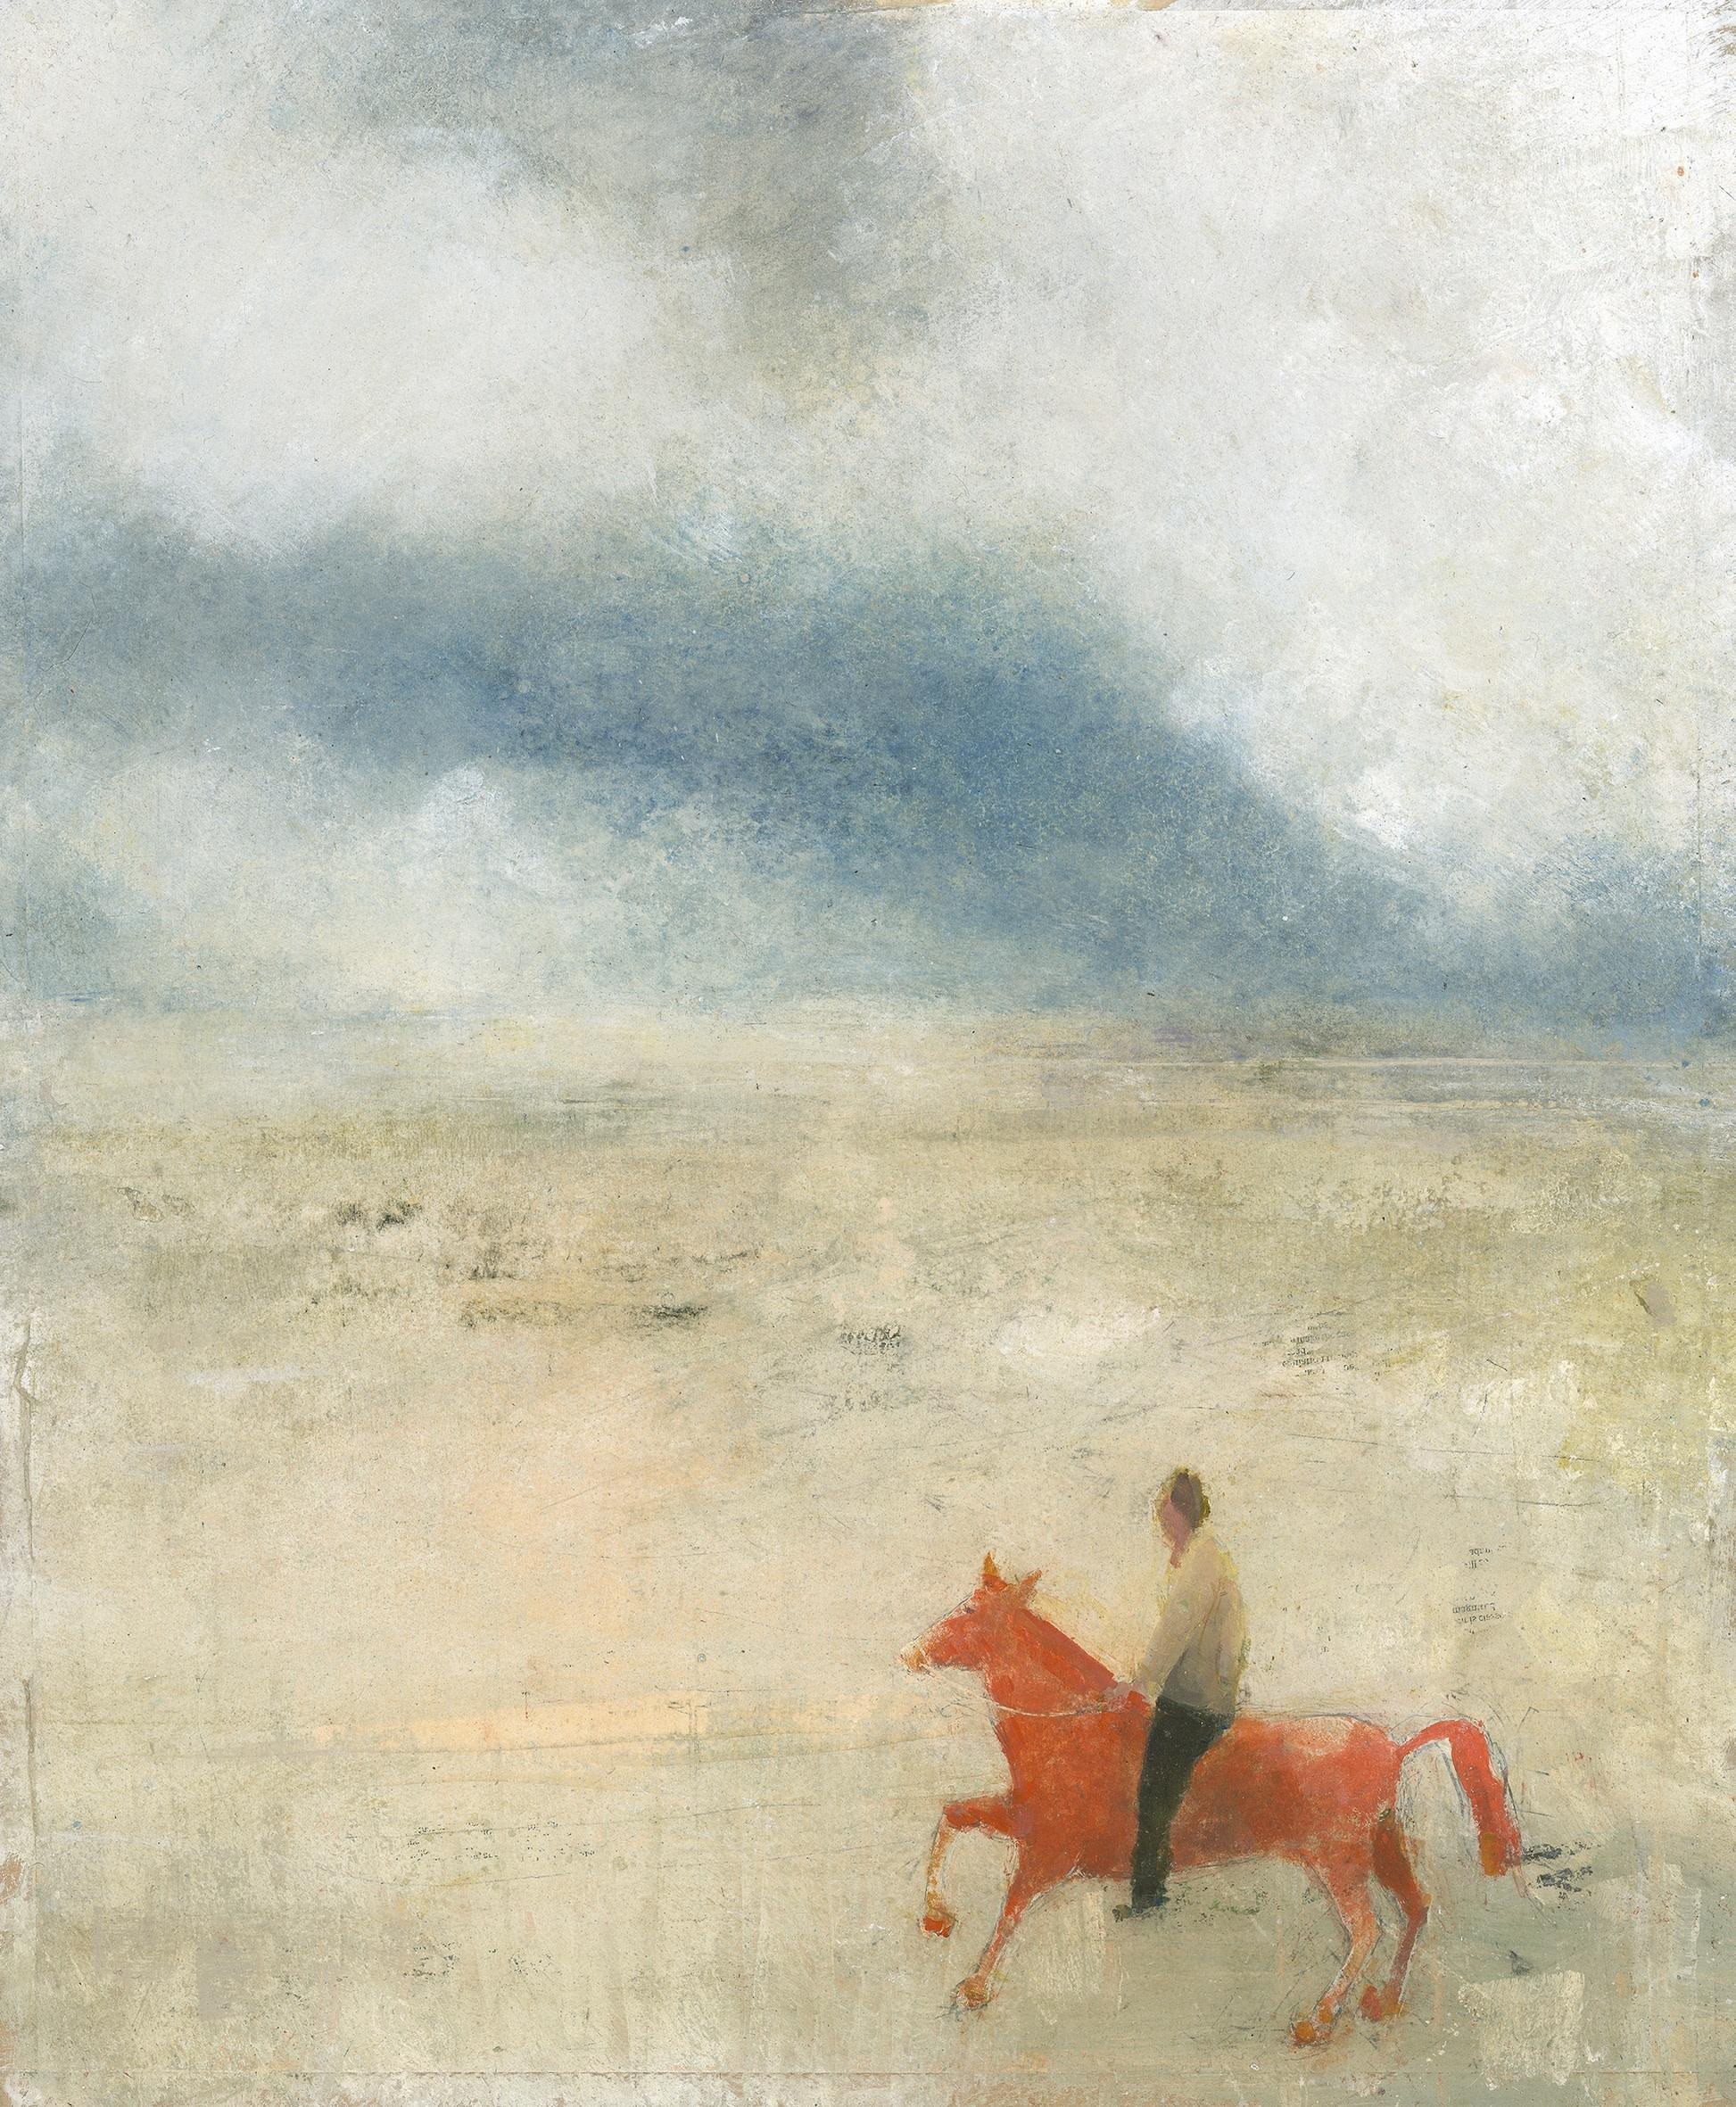 "<span class=""link fancybox-details-link""><a href=""/artists/47-david-brayne/works/11400-david-brayne-red-horse/"">View Detail Page</a></span><div class=""artist""><span class=""artist""><strong>David Brayne</strong></span></div><div class=""title""><em>Red Horse</em></div><div class=""medium"">pigment & acrylic</div><div class=""dimensions"">58x70cm</div><div class=""price"">£2,400.00</div>"